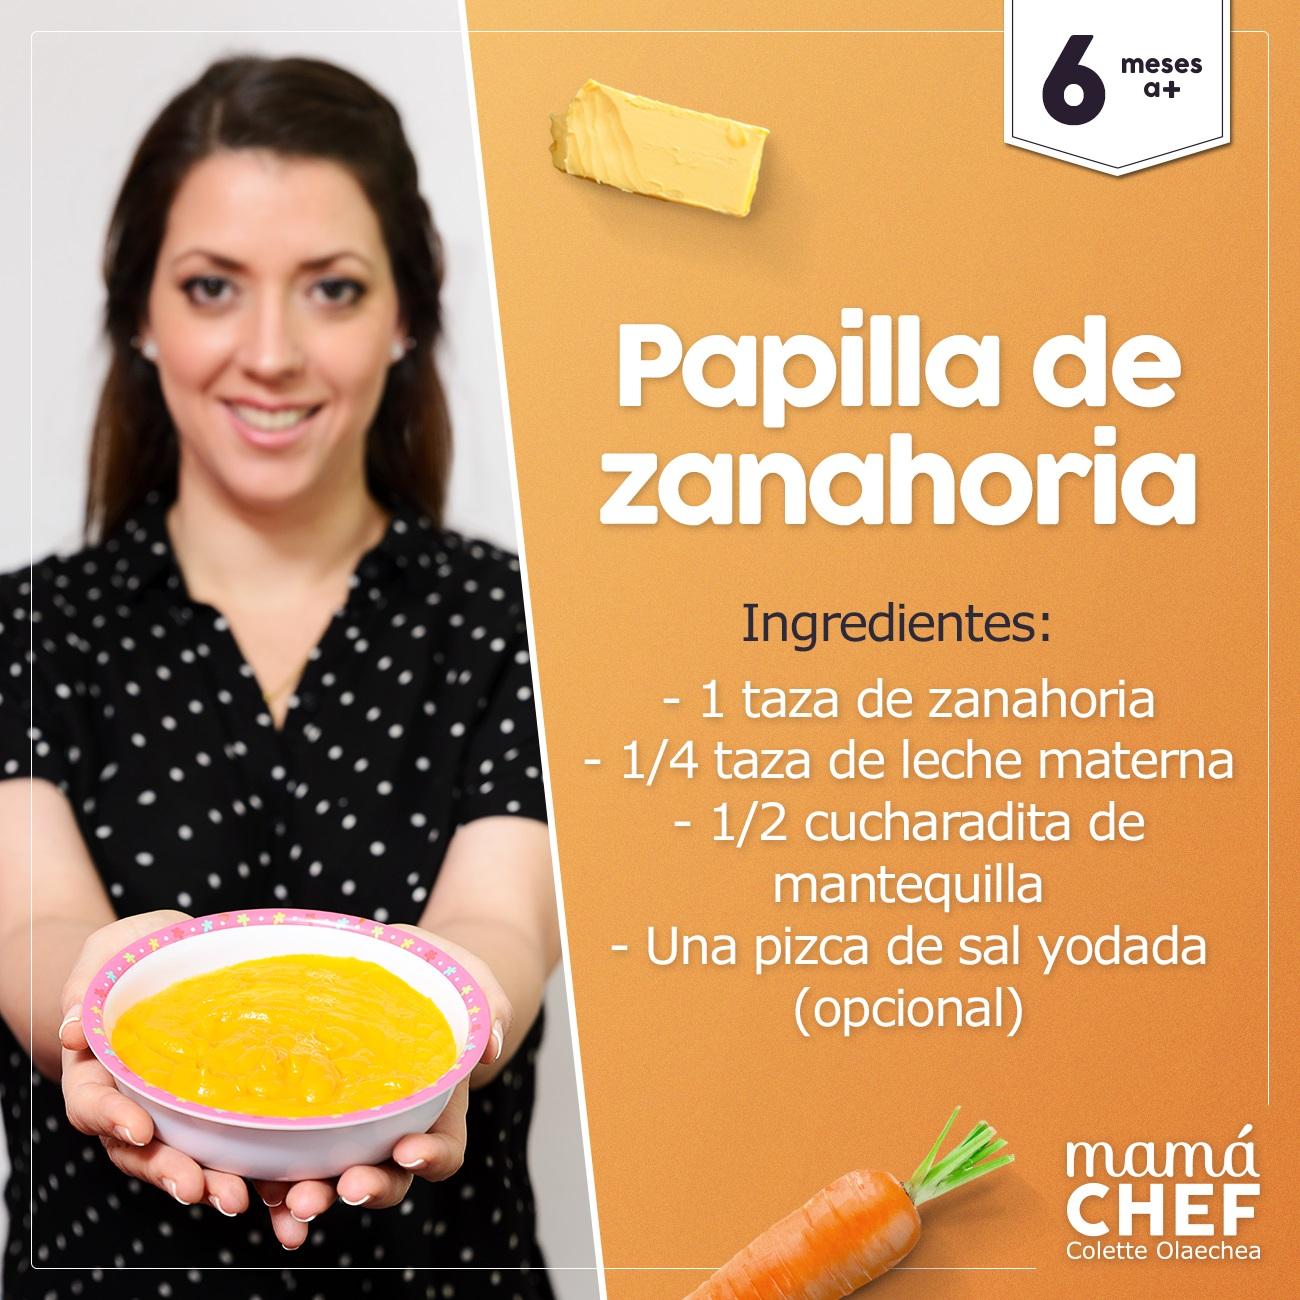 Papillas papilla  bebes 6 meses Mama Chef Colette Olaechea zanahoria